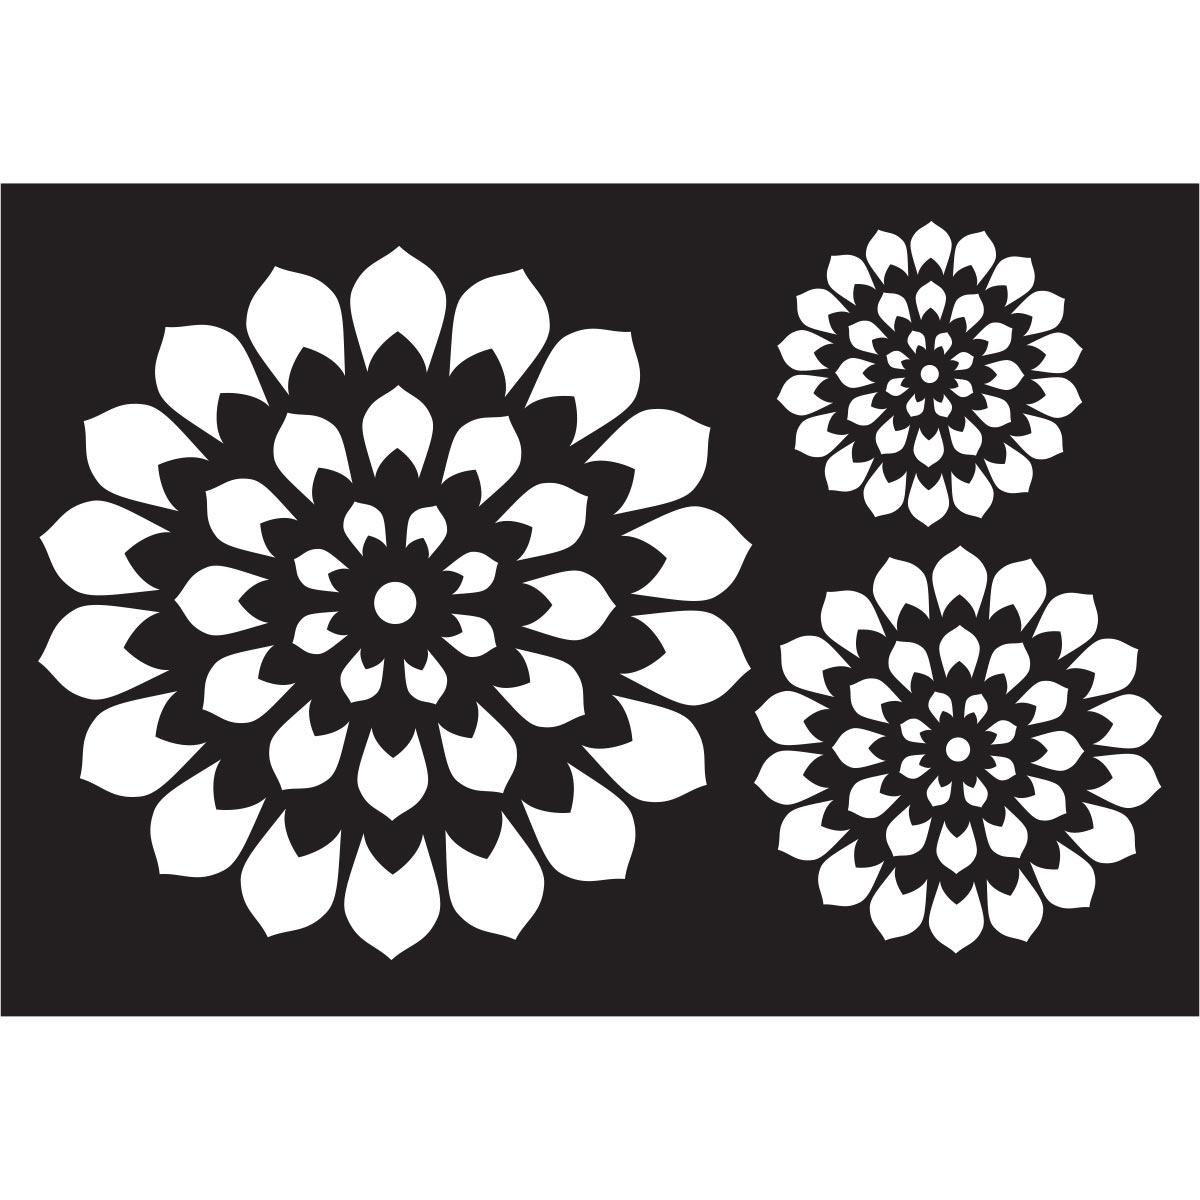 FolkArt ® Painting Stencils - Pinwheels Motif